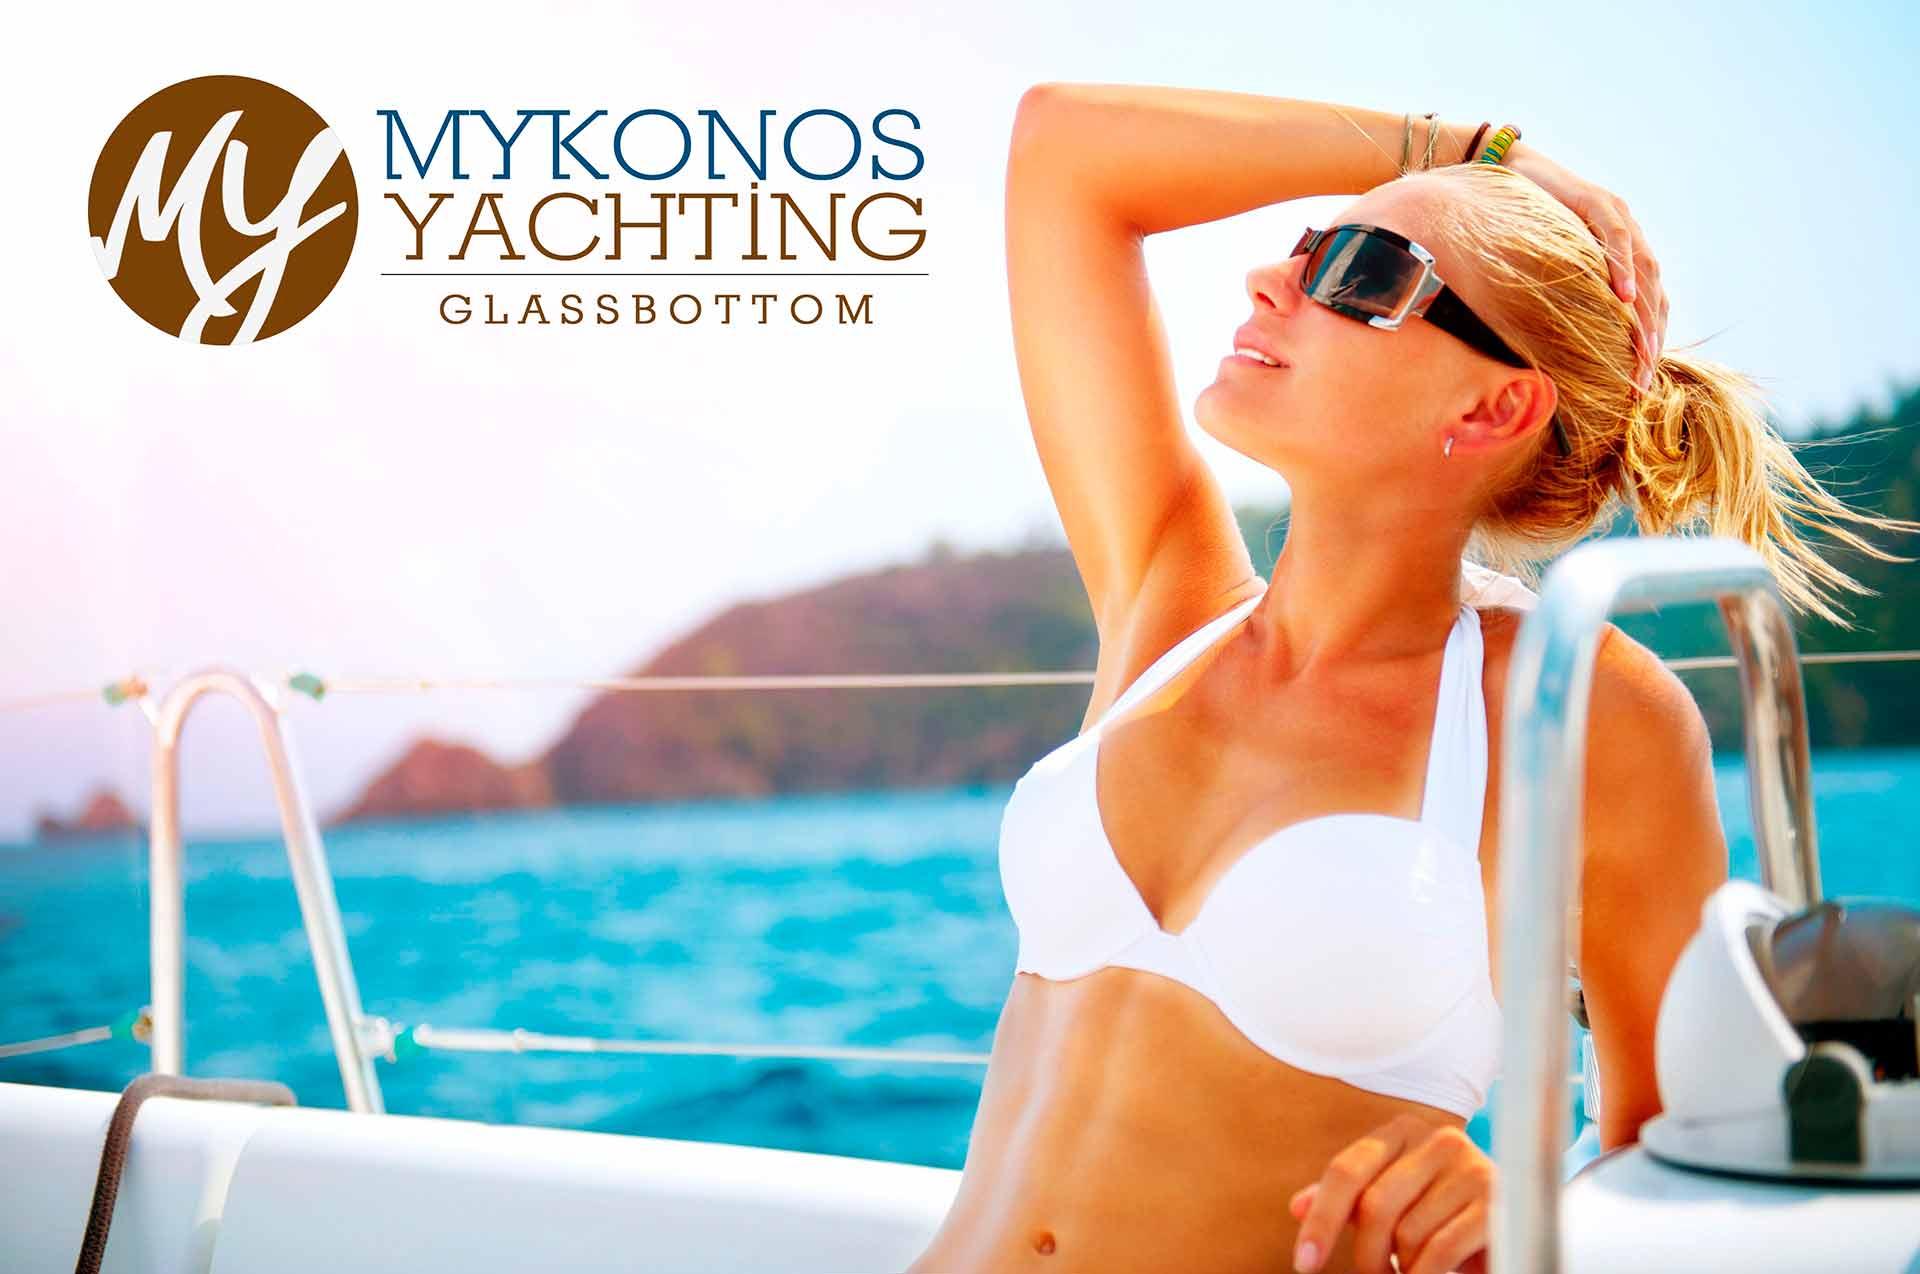 Mykonos Yachting Main